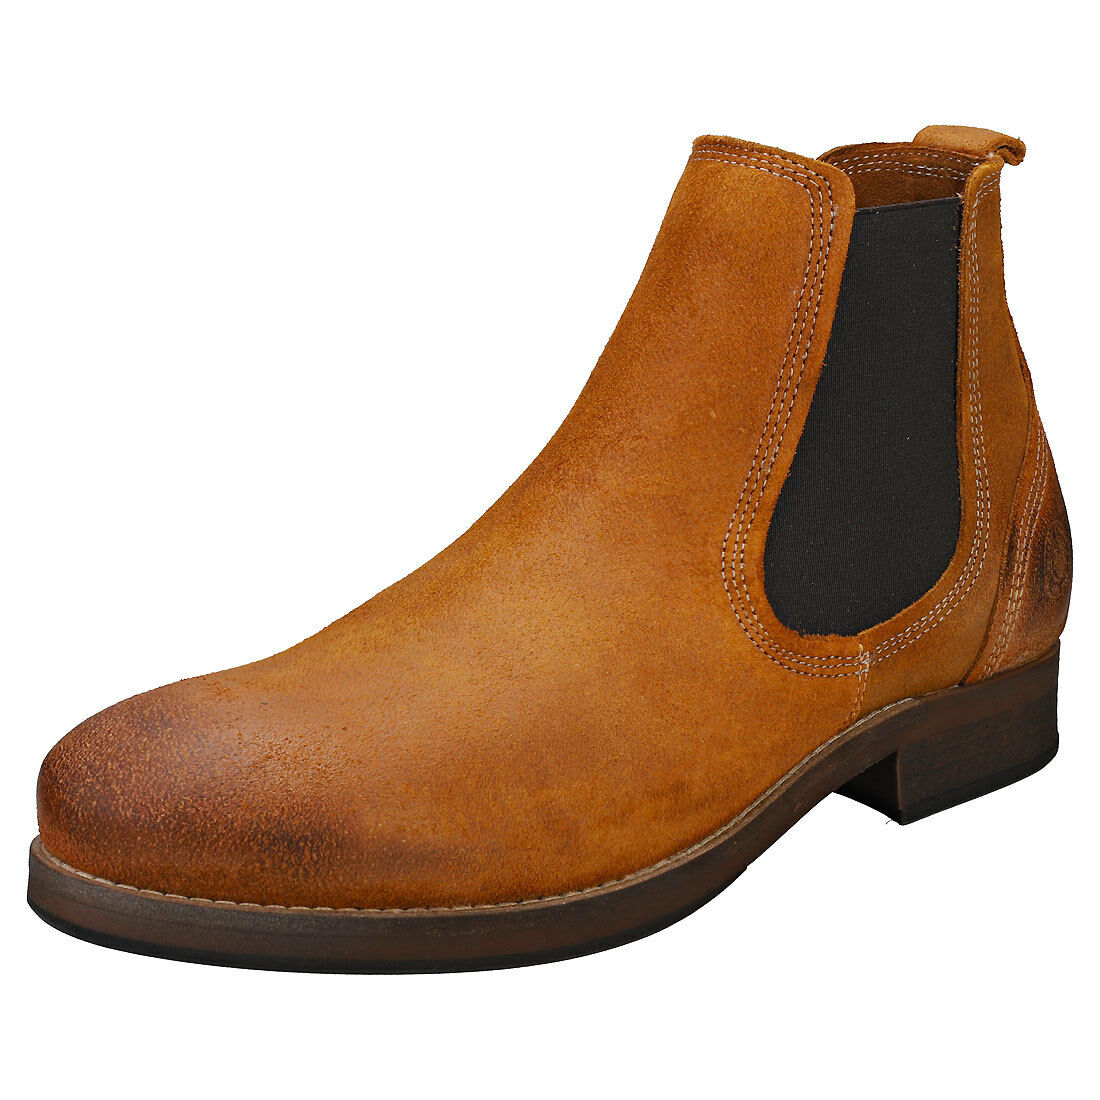 ASICS onitsuka tiger Gel Lyte 5  v h50bk-8090 Basket  Chaussure s Chaussures  5 s Neuf New 49fcef